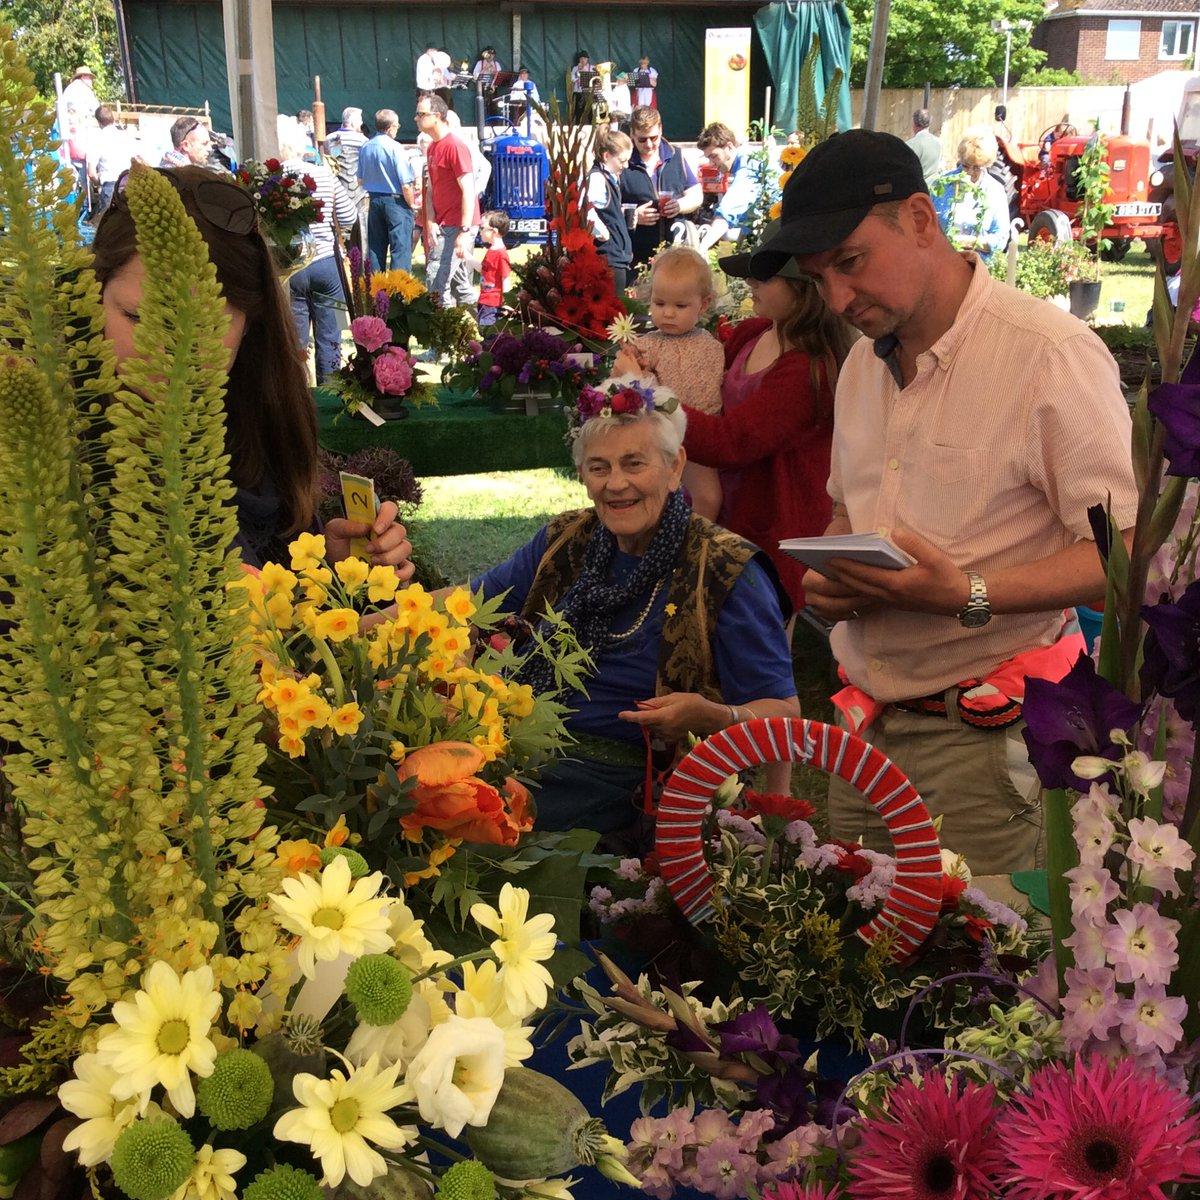 Fantastic day#OFS16 with Matt Naylor. My wife Lorna judging flower arrangements https://t.co/2wxo89Z4Rl